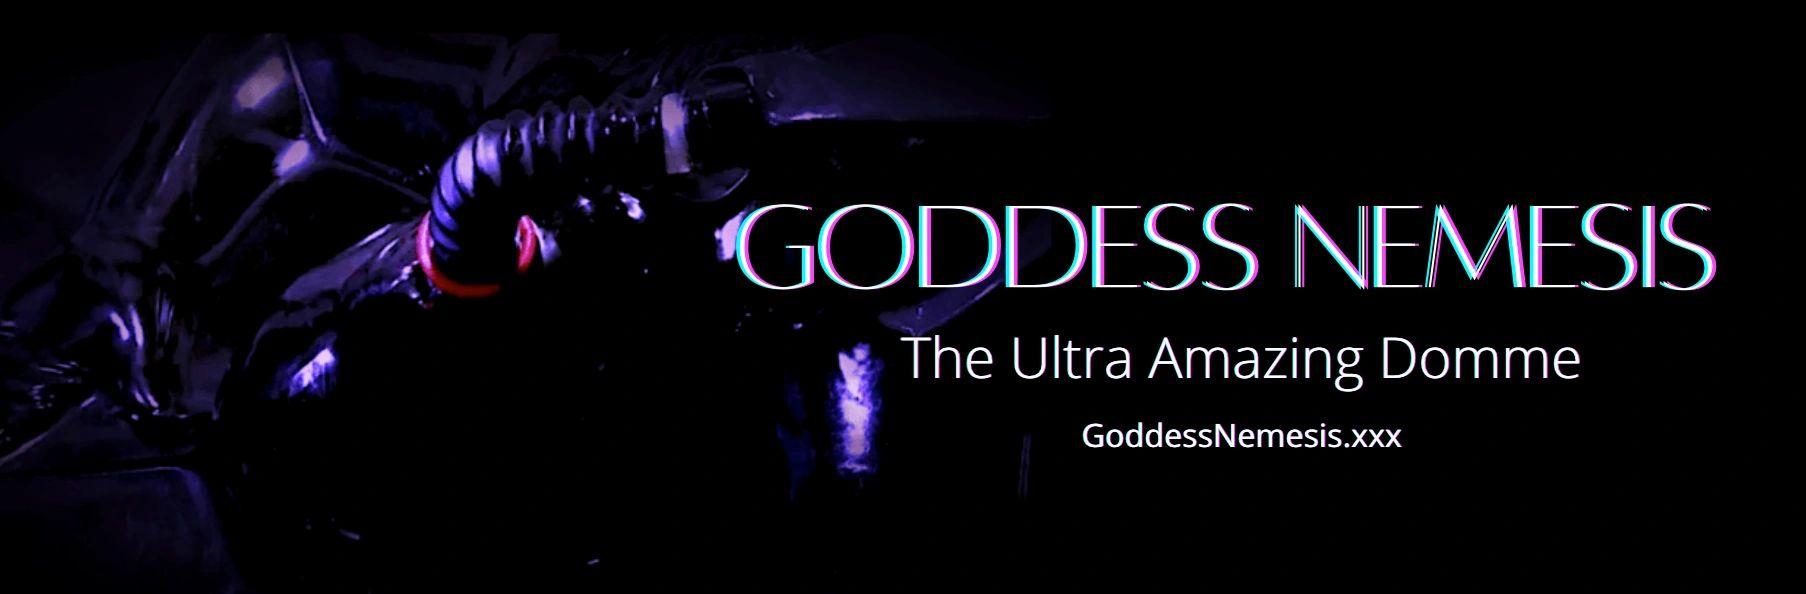 95 Goddess Nemesis